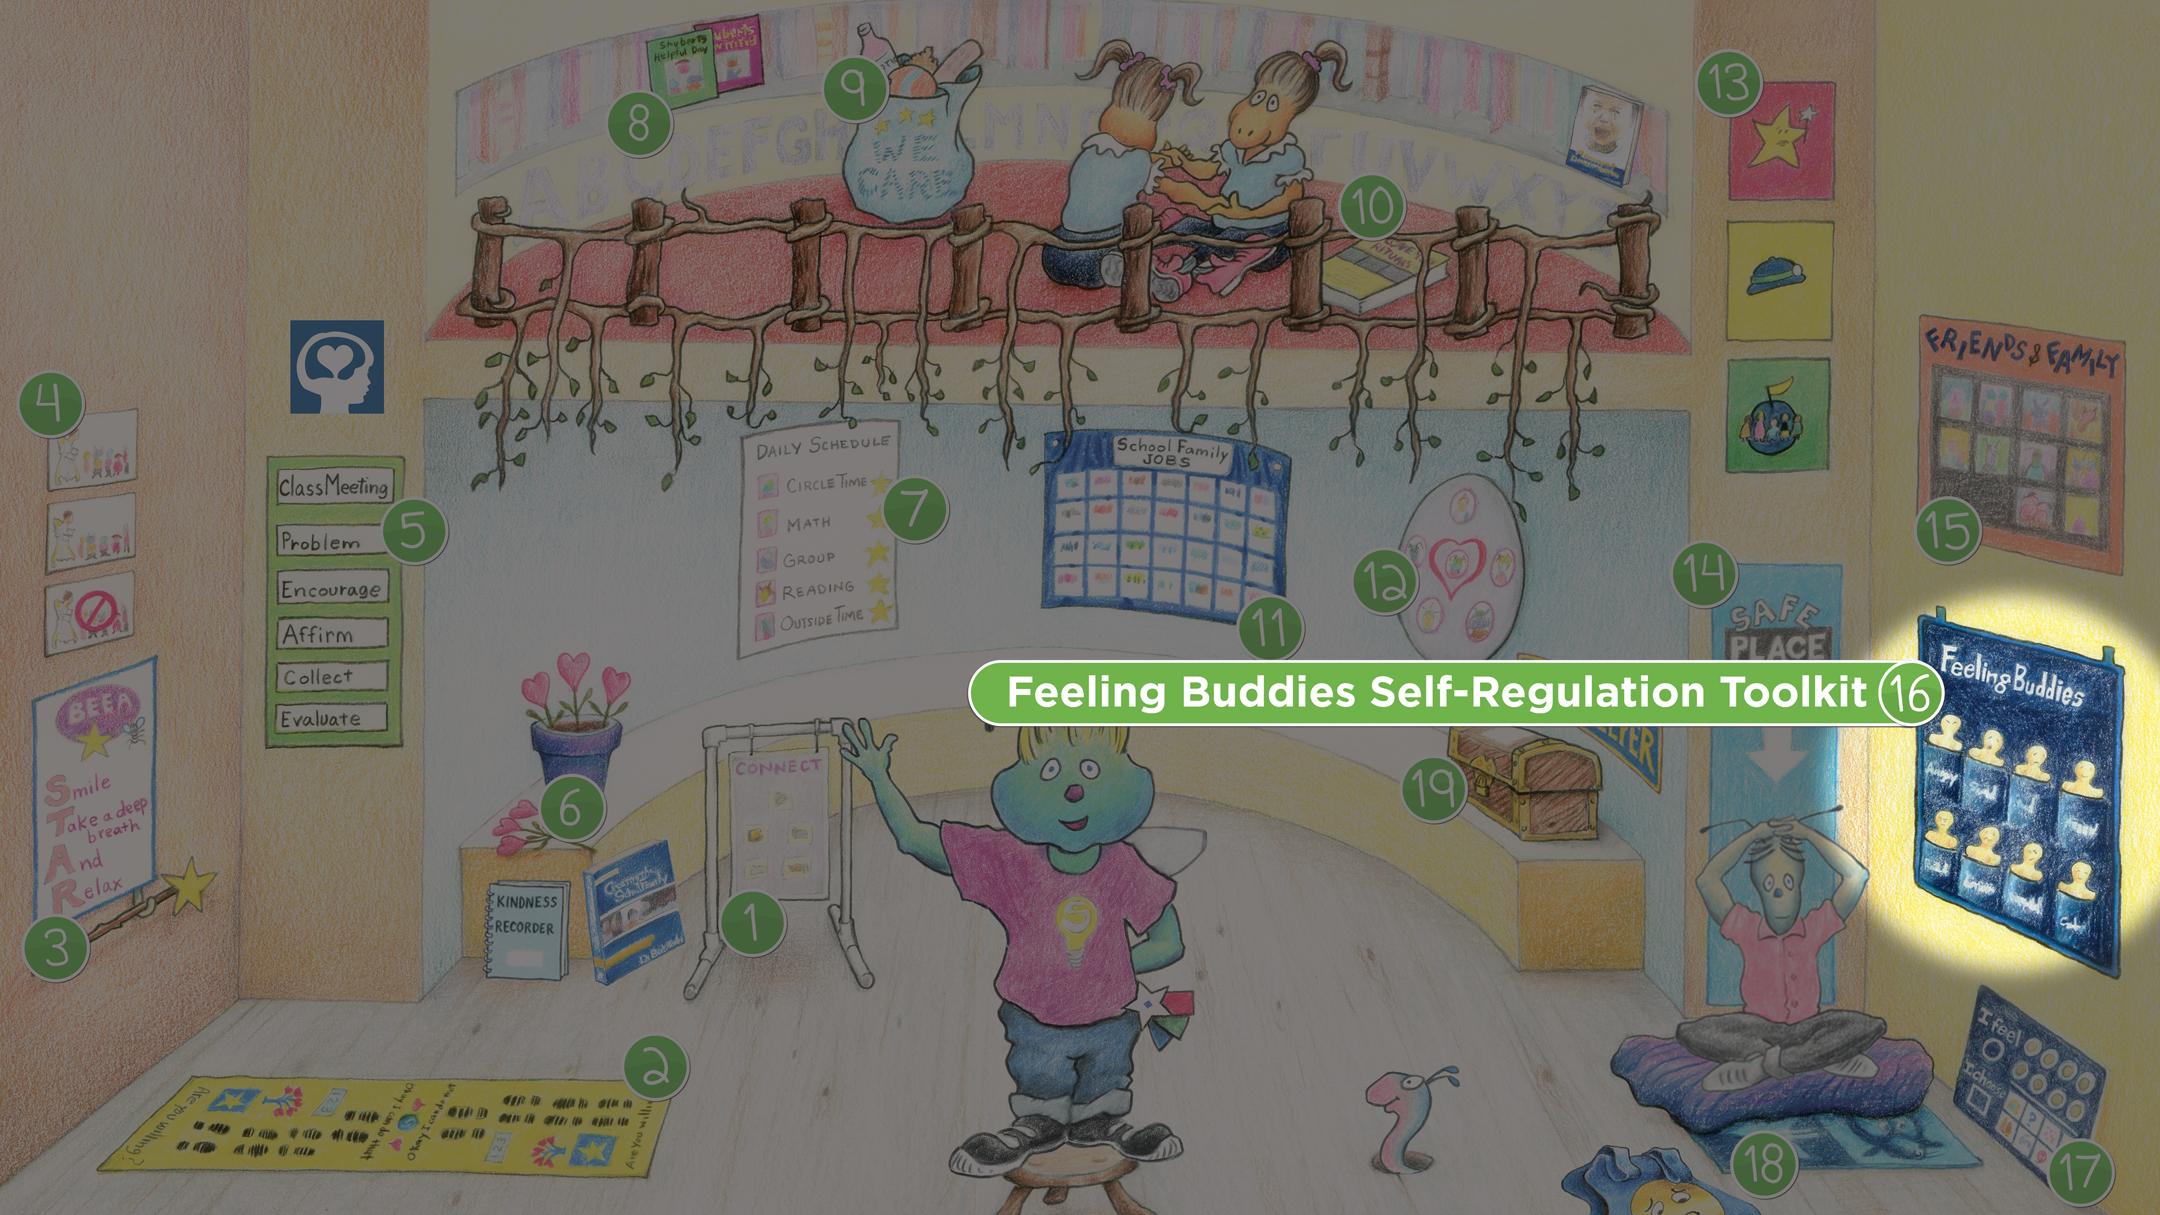 Shuberts Classroom Feeling Buddies Self-Regulation Toolkit